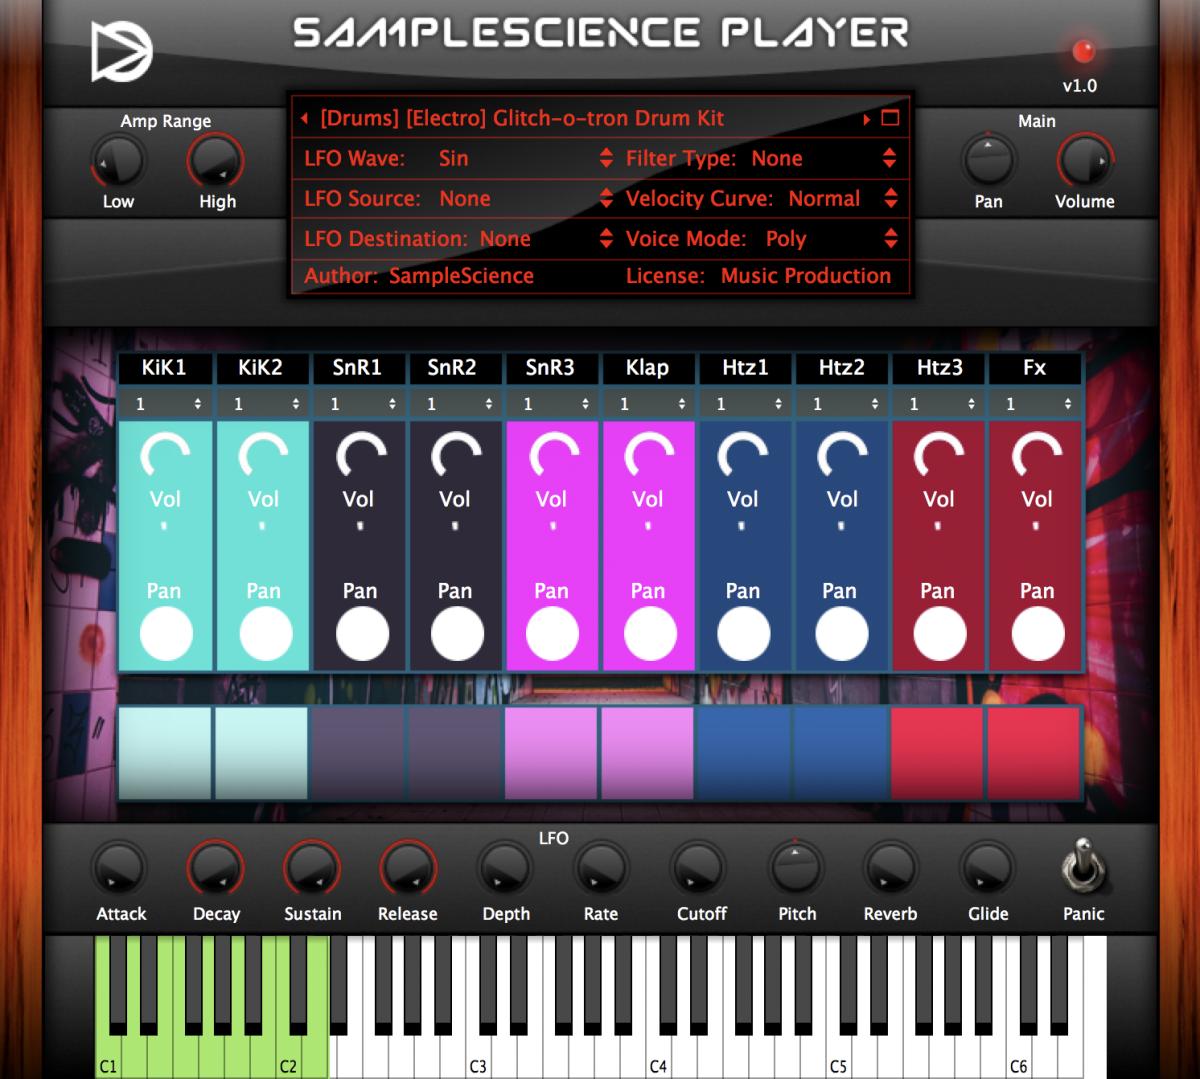 Møme SampleScience Player